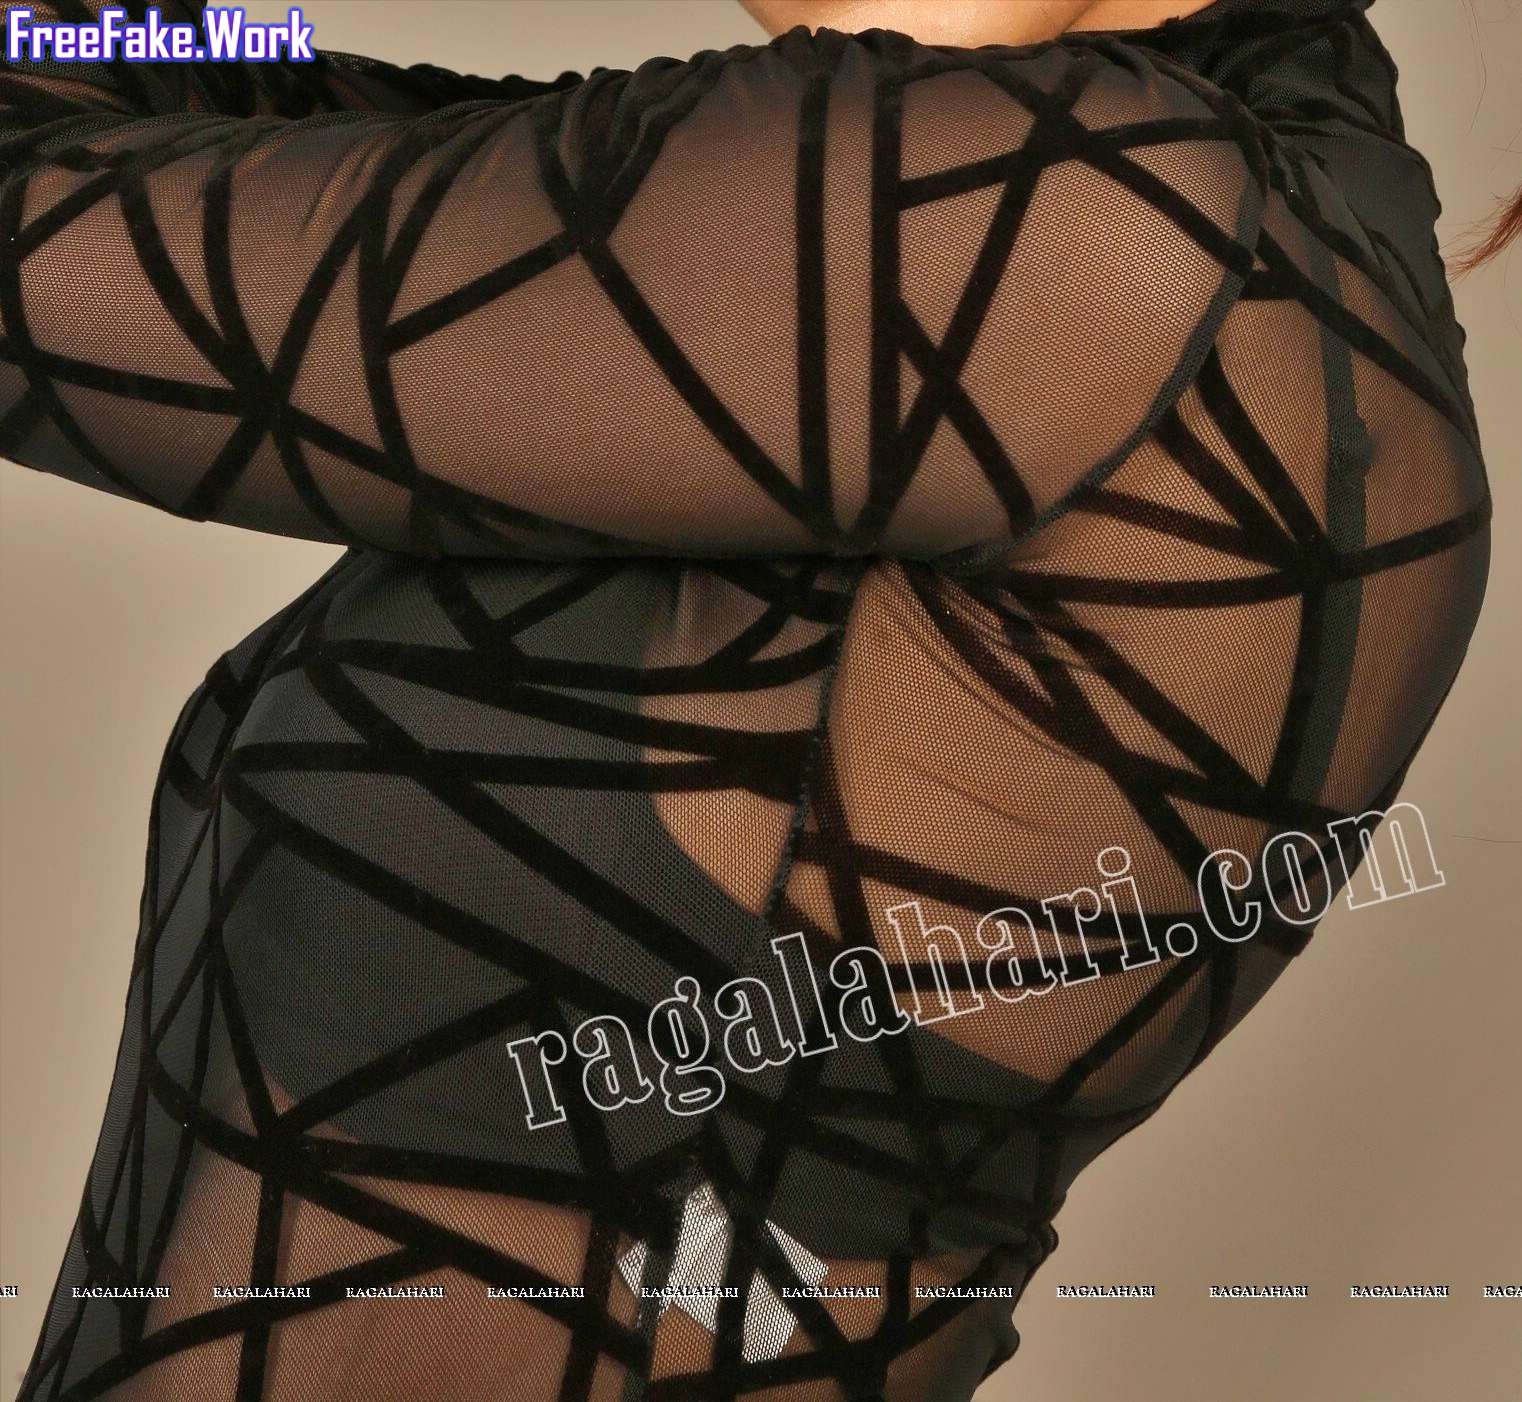 Hot-Supraja-Narayan-black-bra-close-up-see-through-top-3.jpg